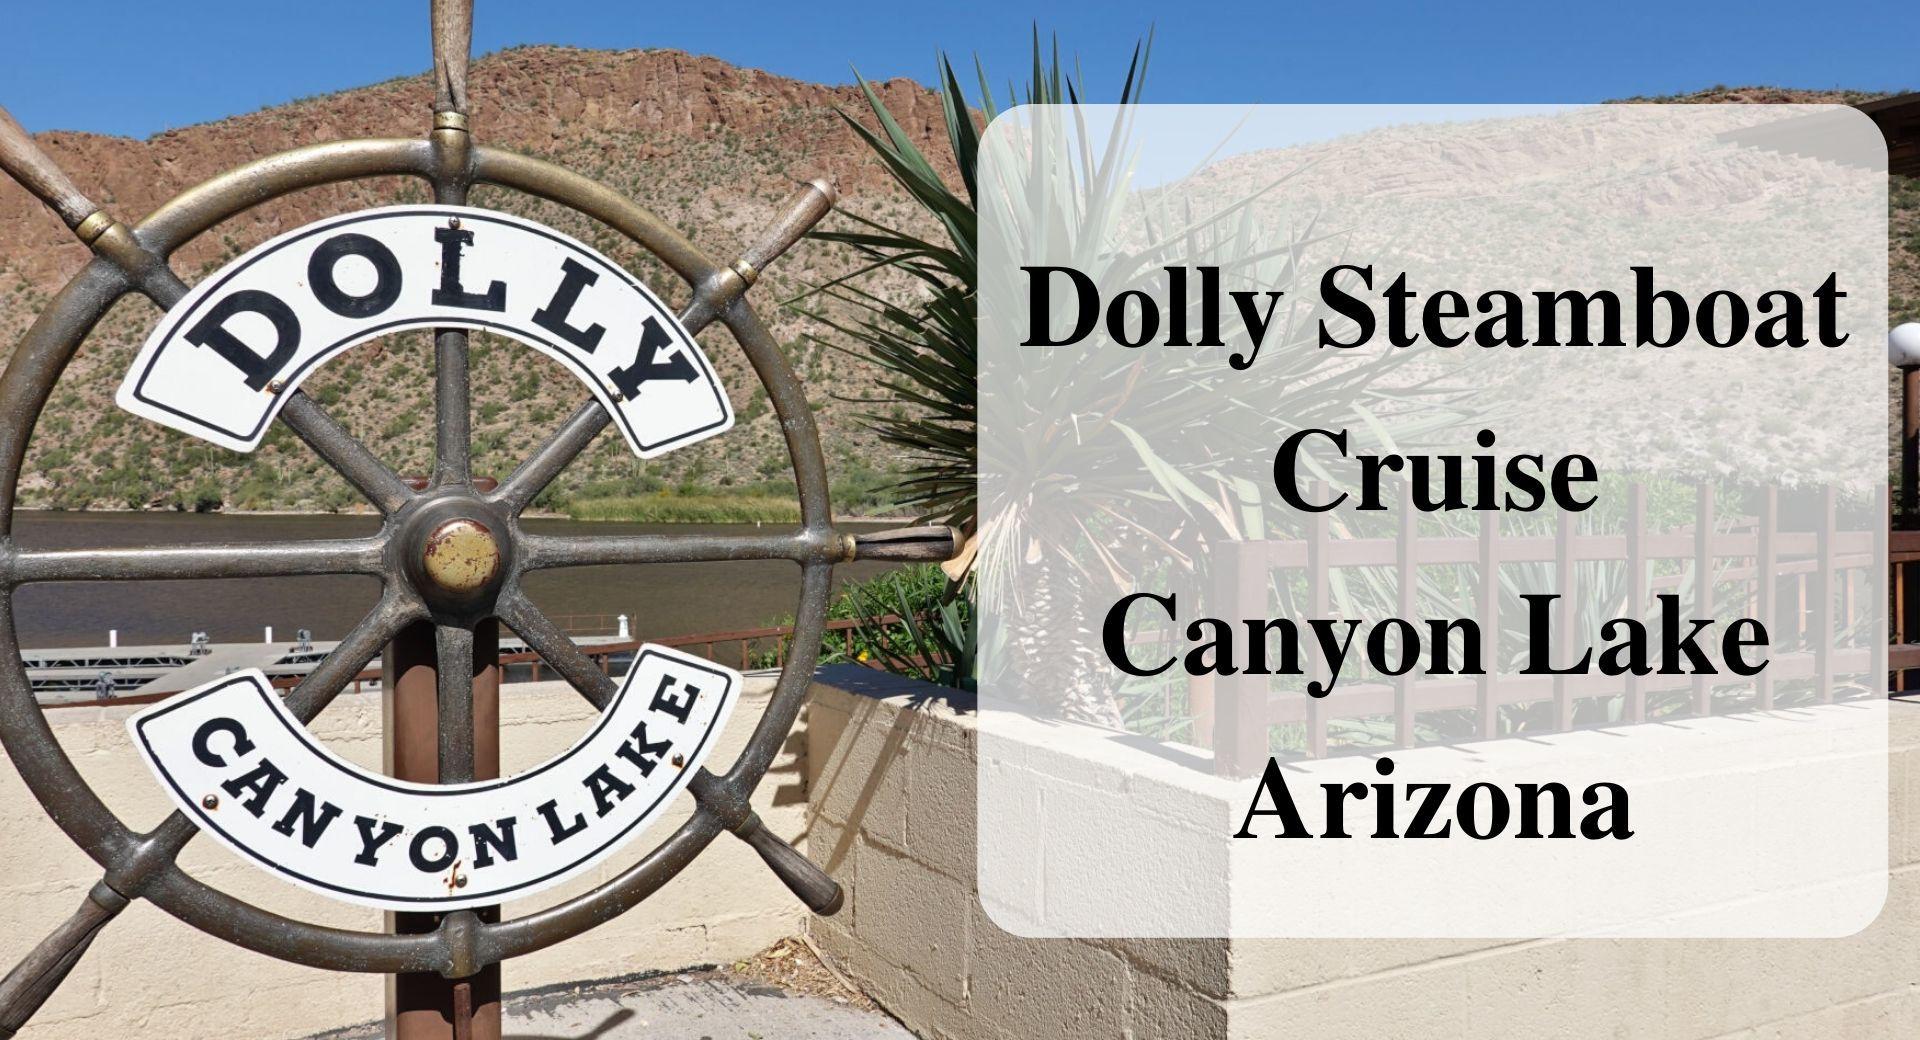 Dolly Steamboat Cruise Canyon Lake Arizona Forever sabbatical